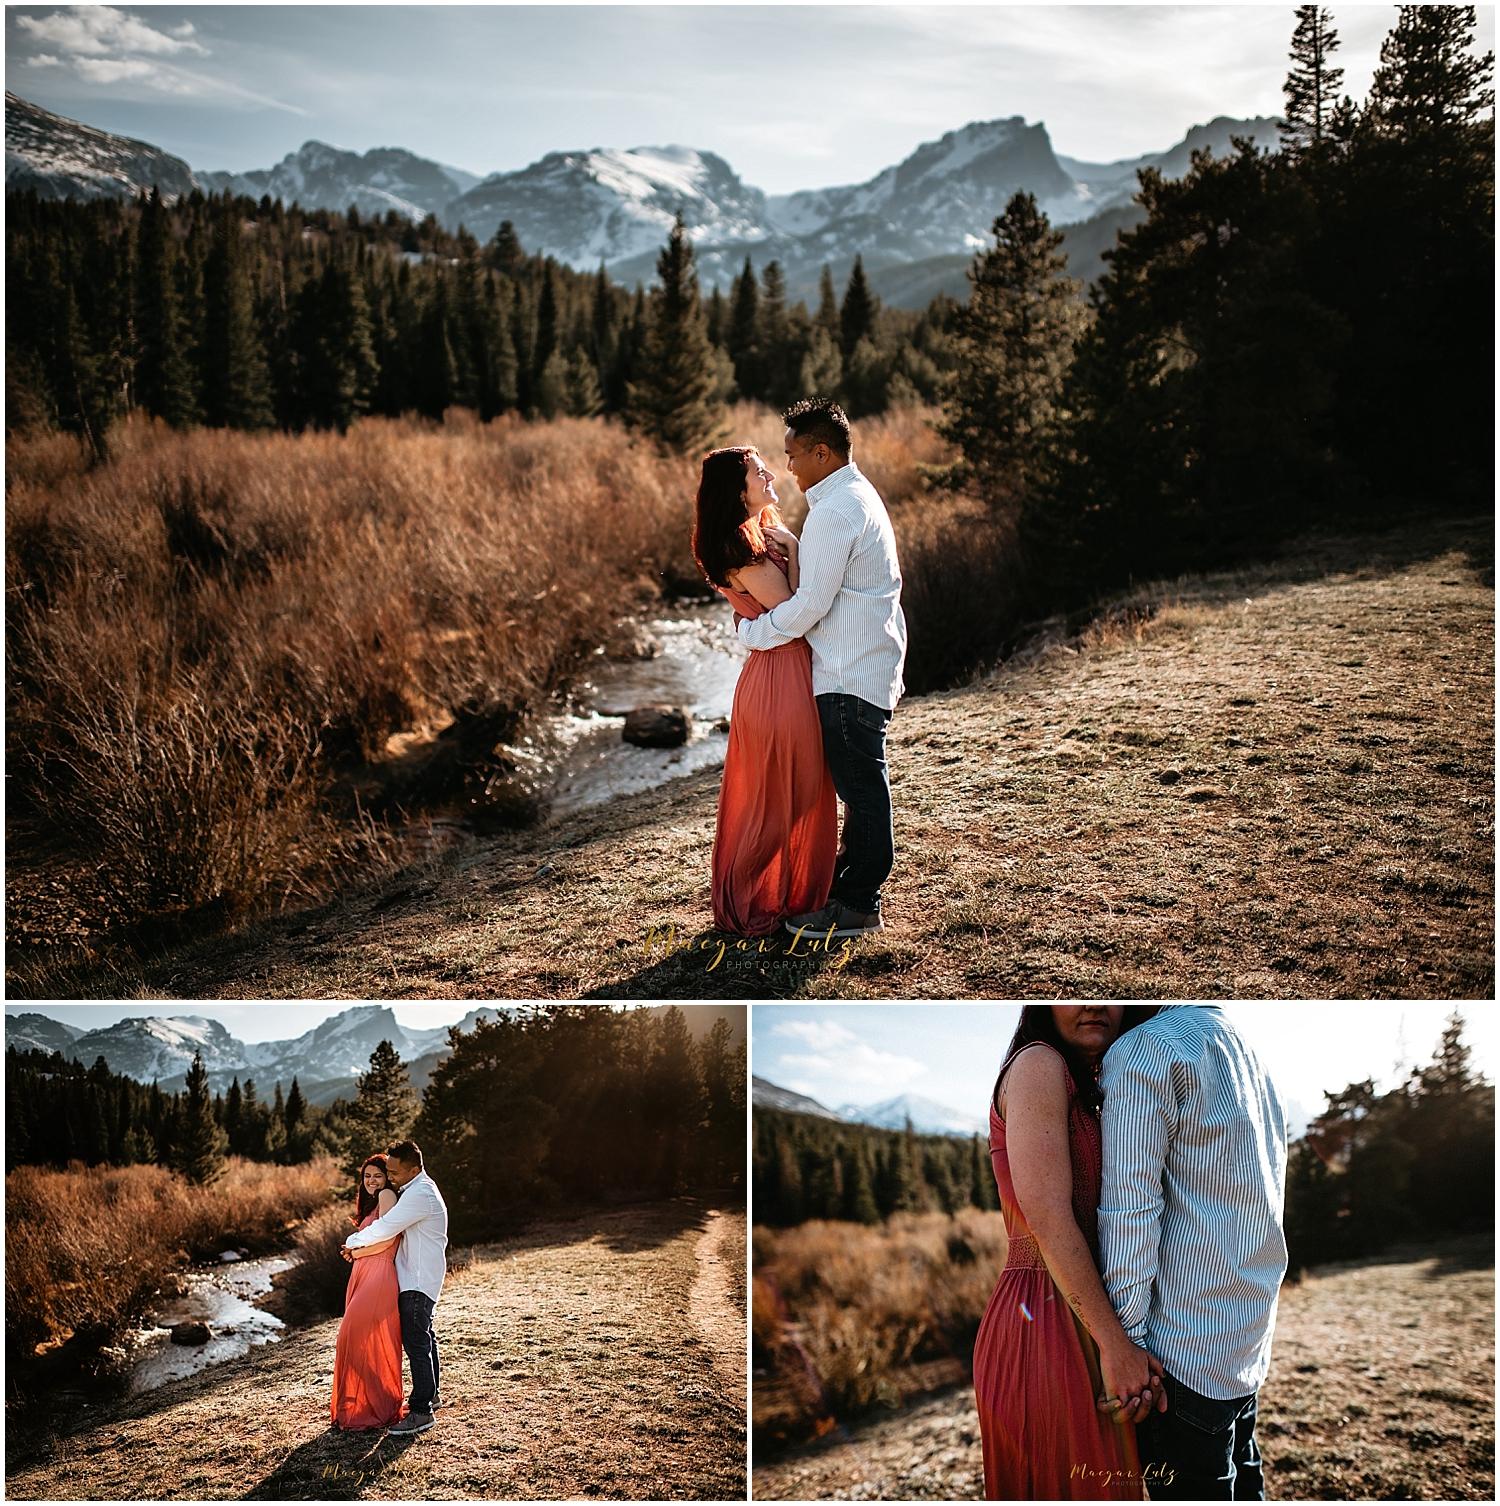 Destination-engagement-wedding-photographer-Colorado-Rocky-Mountain-National-Park-Session_0040.jpg